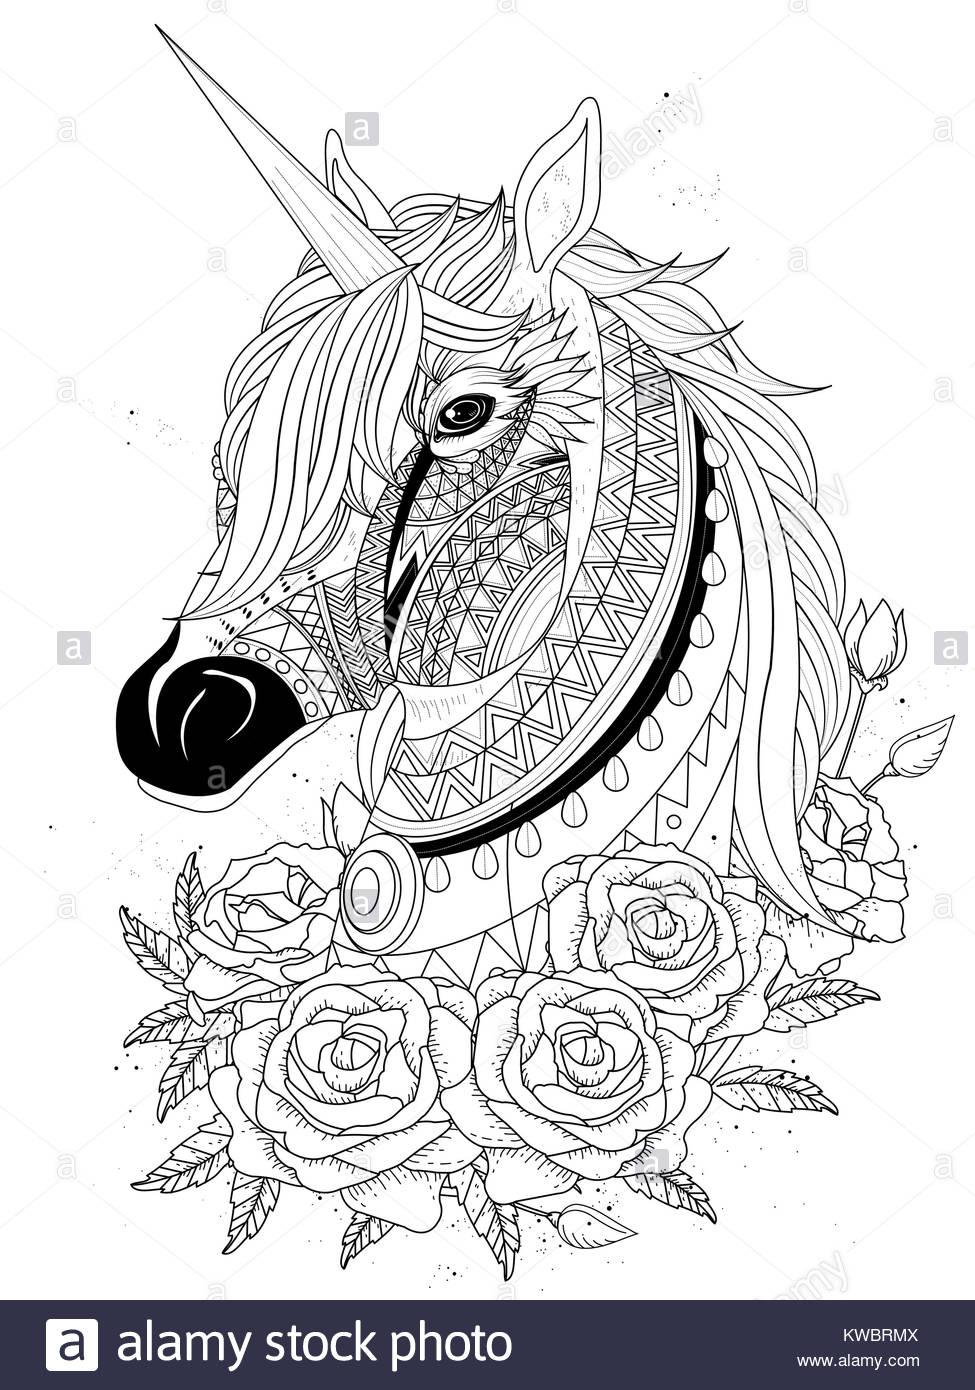 Unicorn Vector Imágenes De Stock & Unicorn Vector Fotos De Stock - Alamy